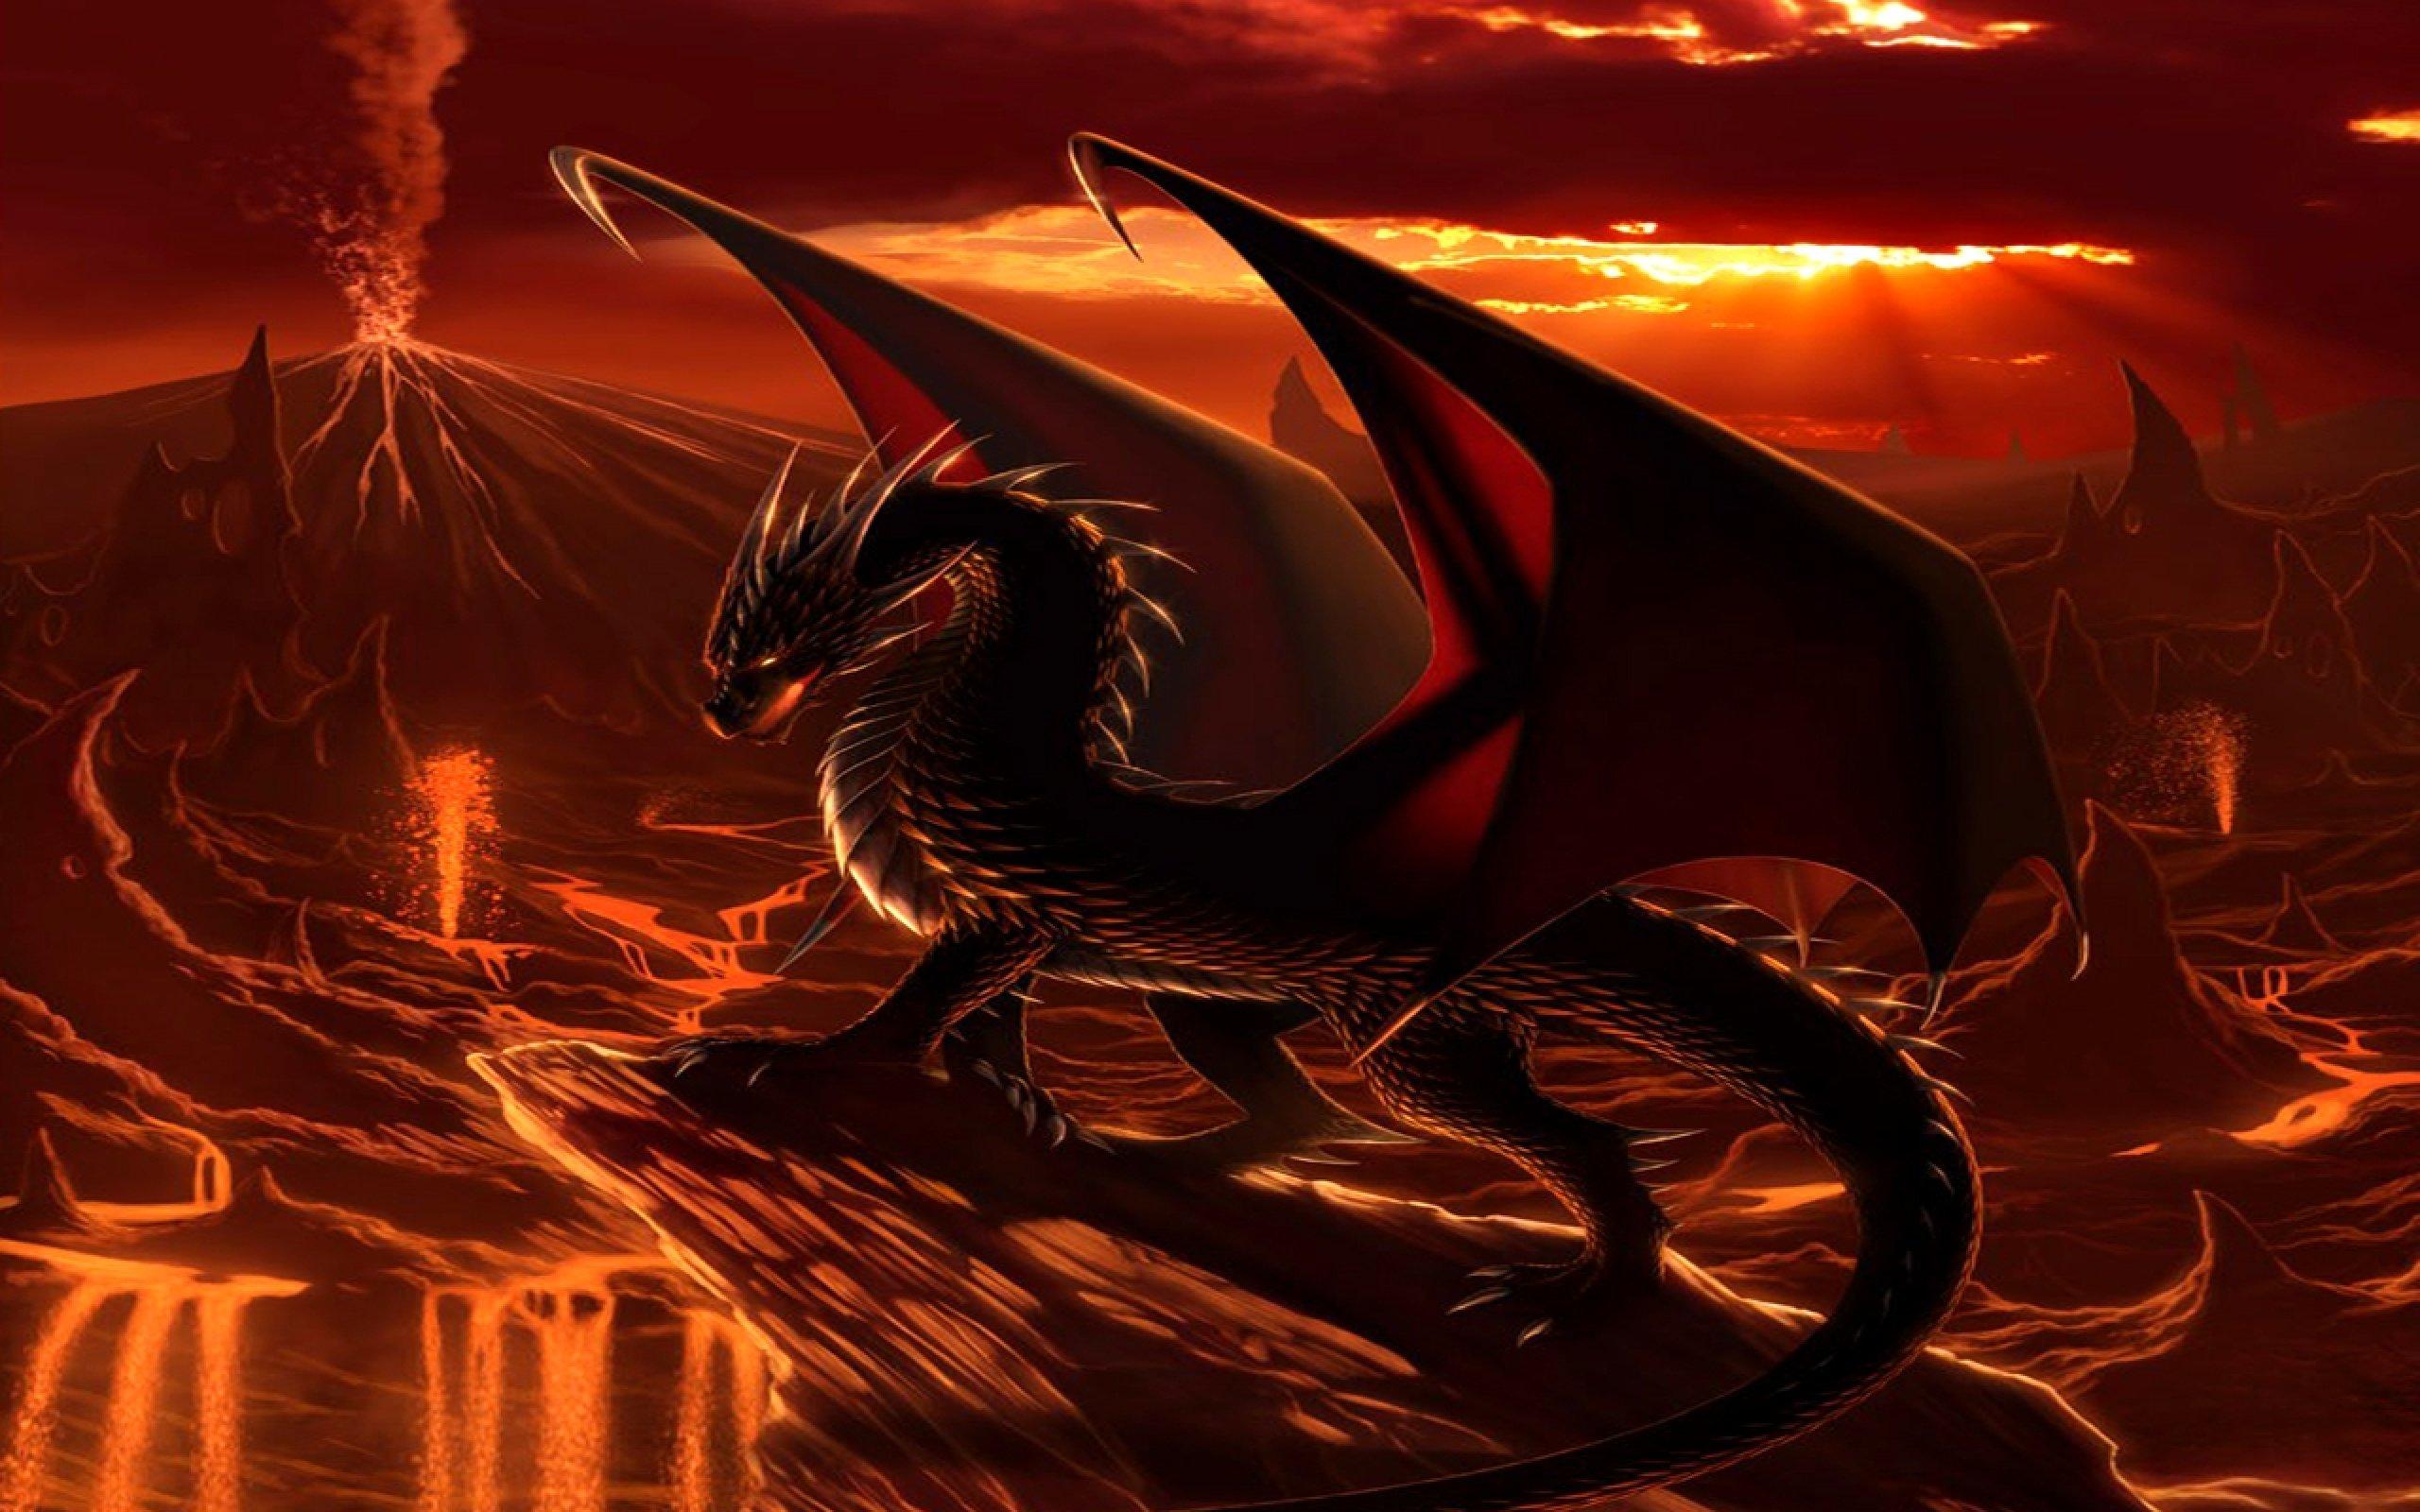 Картинки драконов, девочки картинки